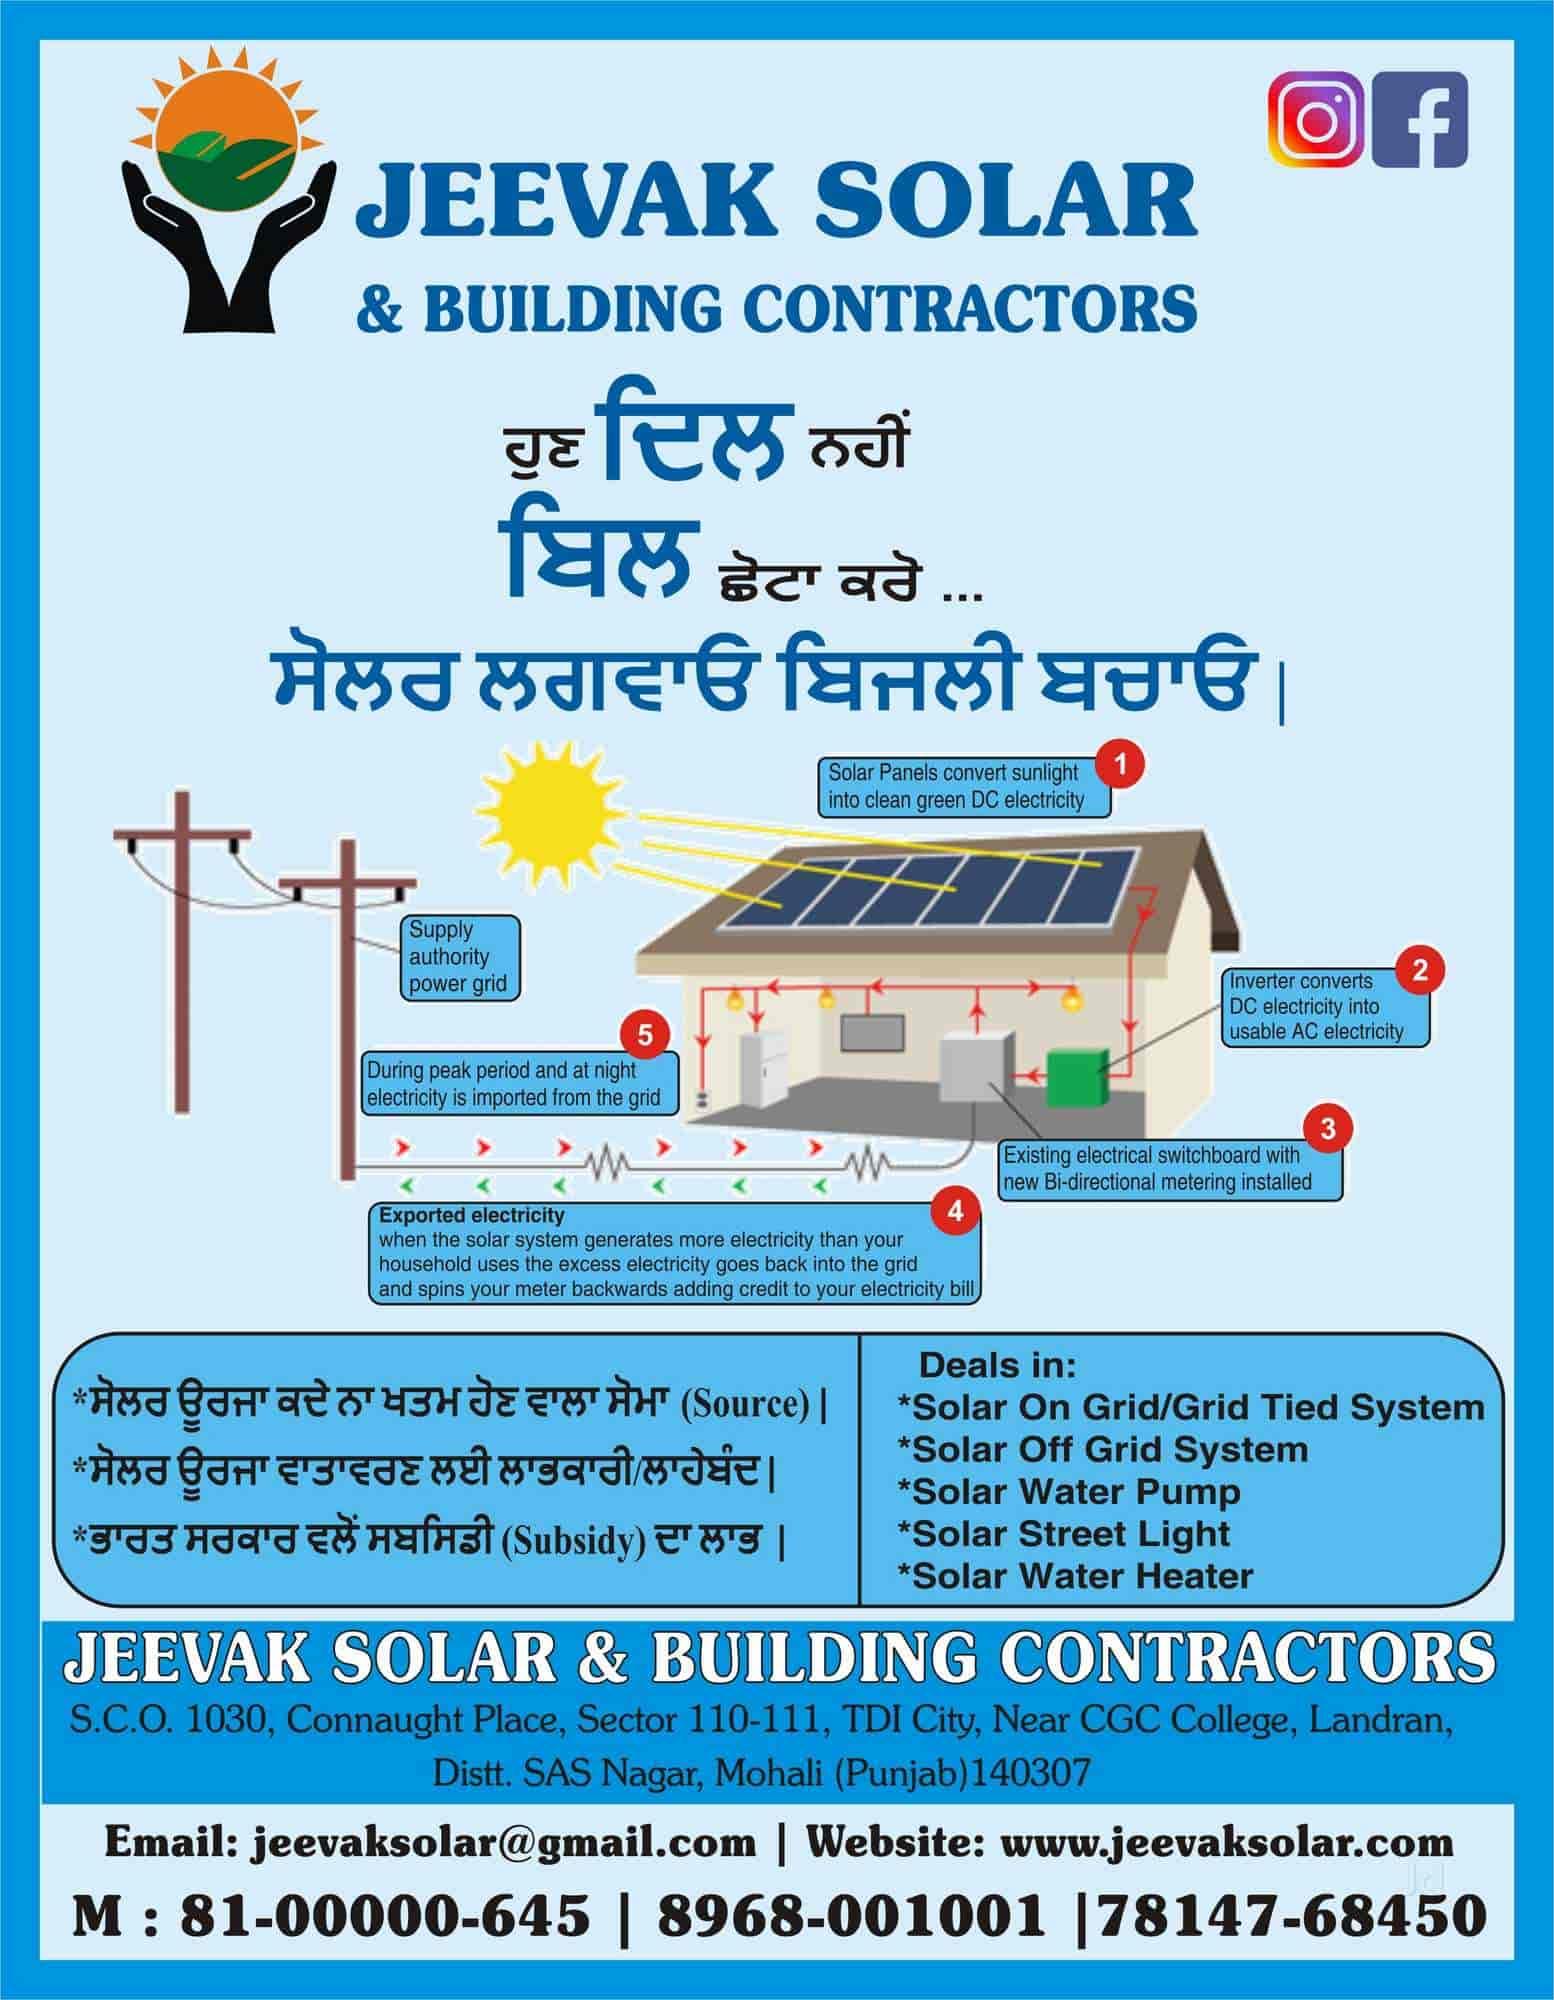 Jeevak Solar And Building Contractors, Landran - Solar Panel